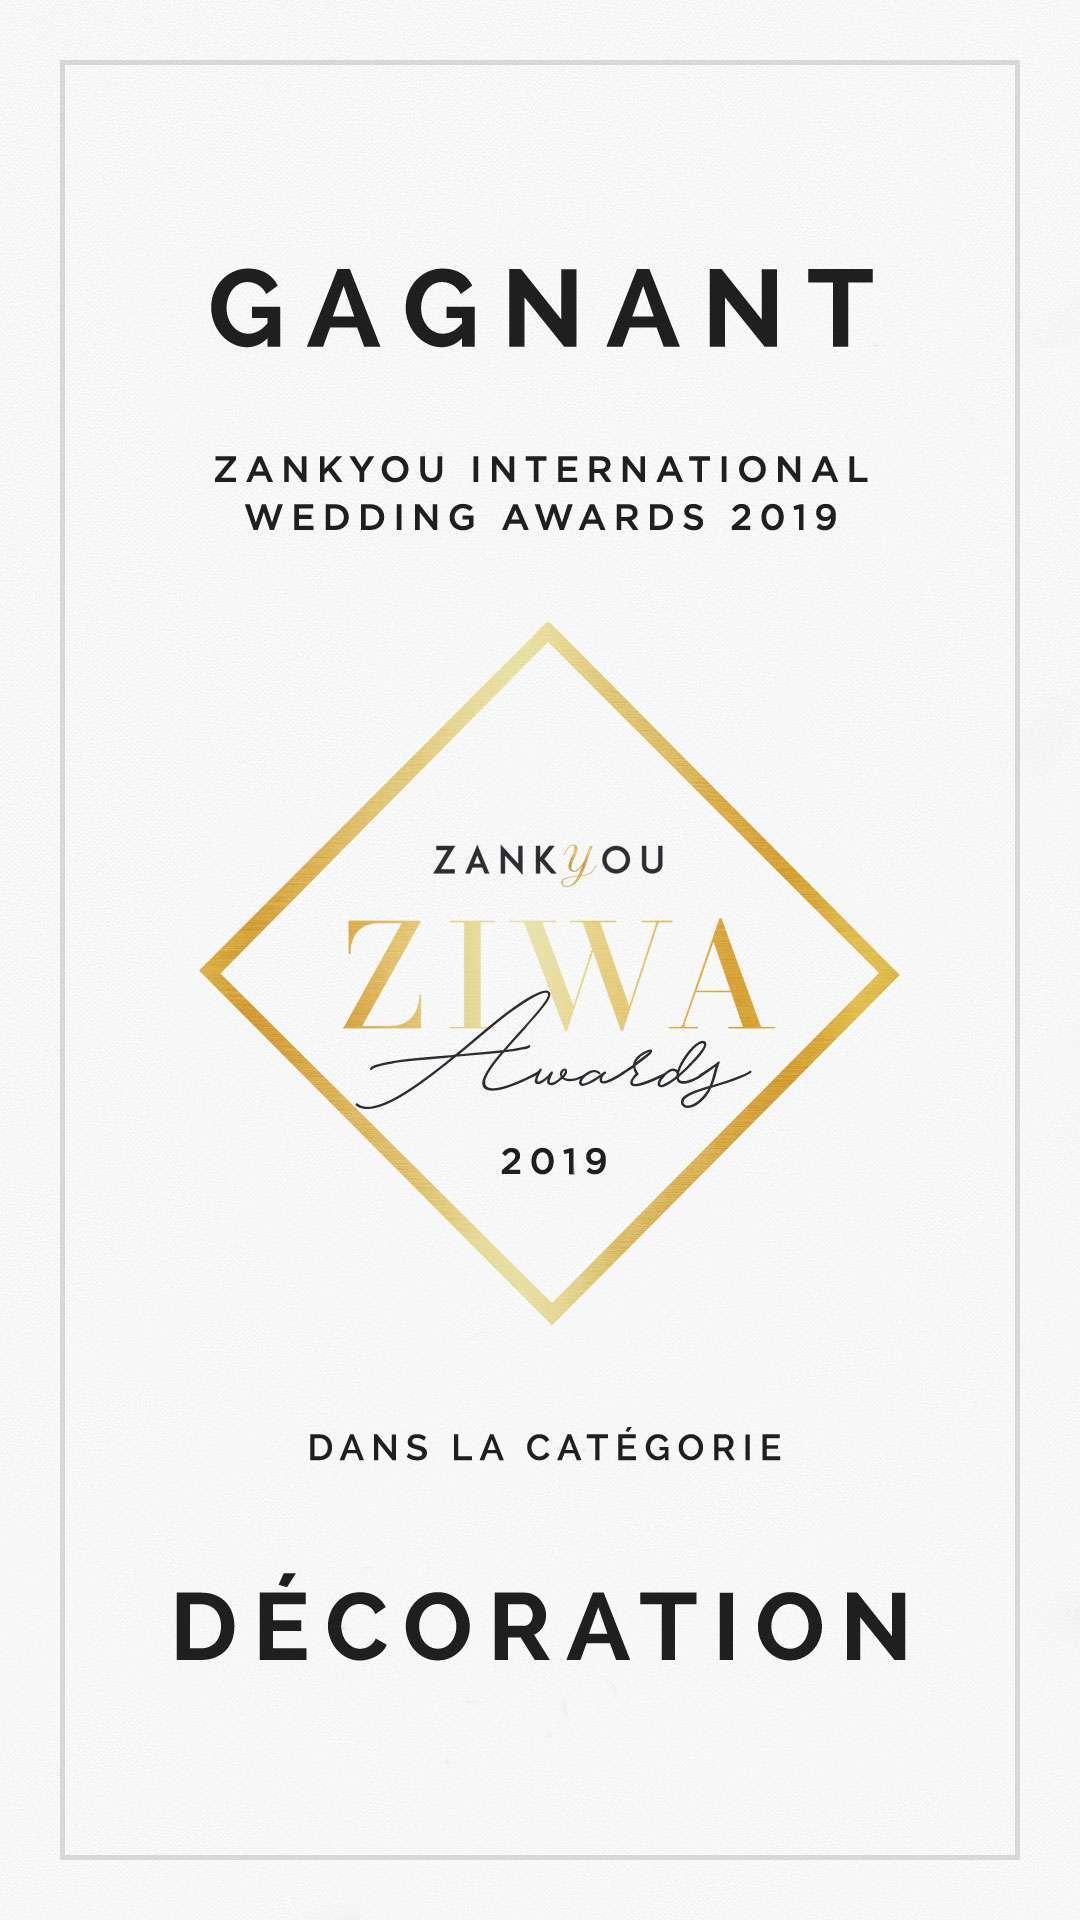 ziwa 2019 Gagnant Decorations de mariage